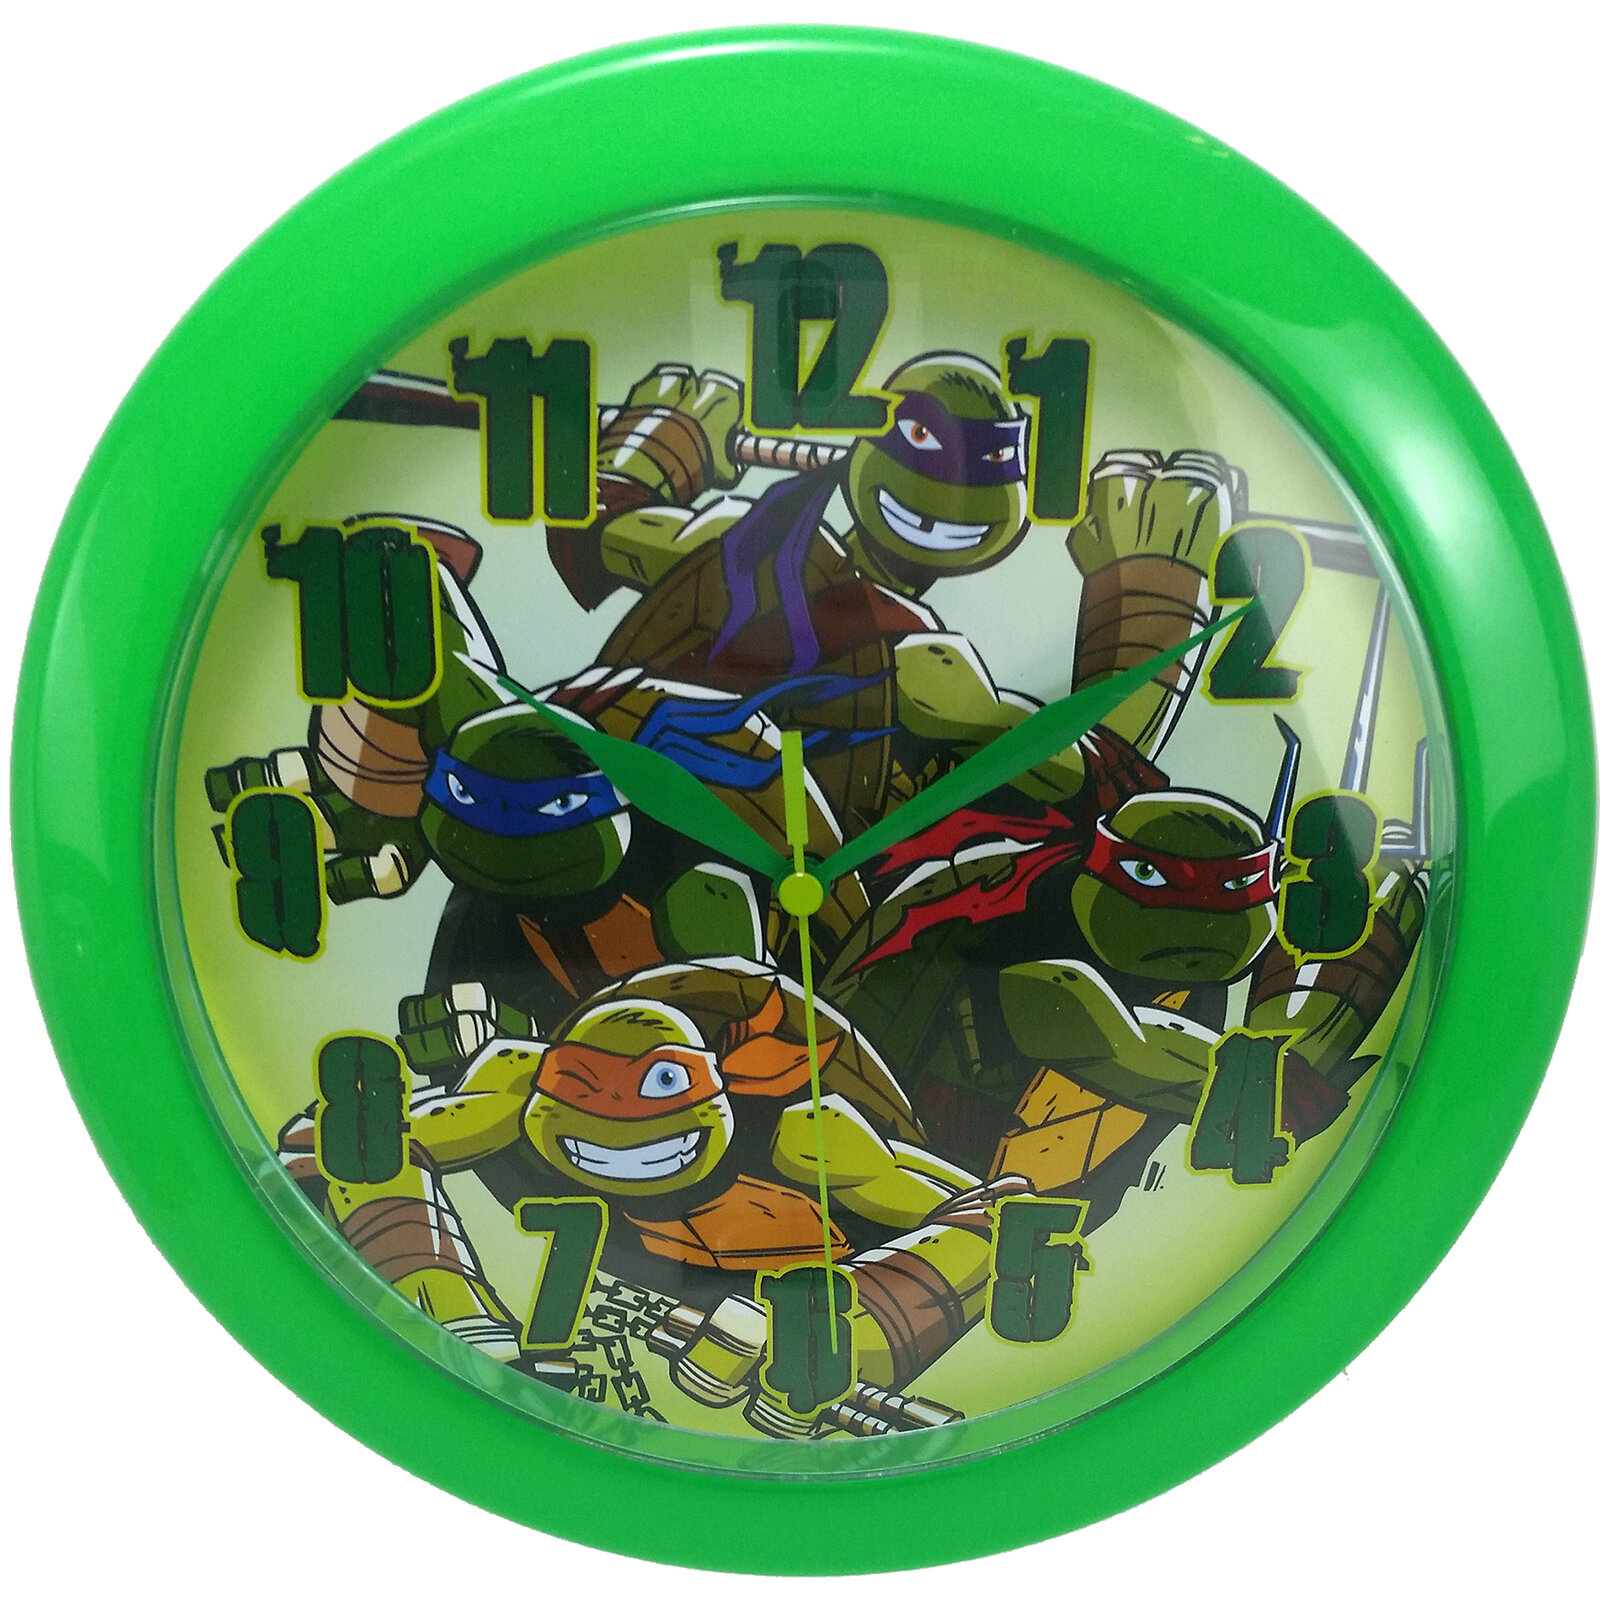 Ashton Sutton 9 75 Teenage Mutant Ninja Turtle Wall Clock Wayfair